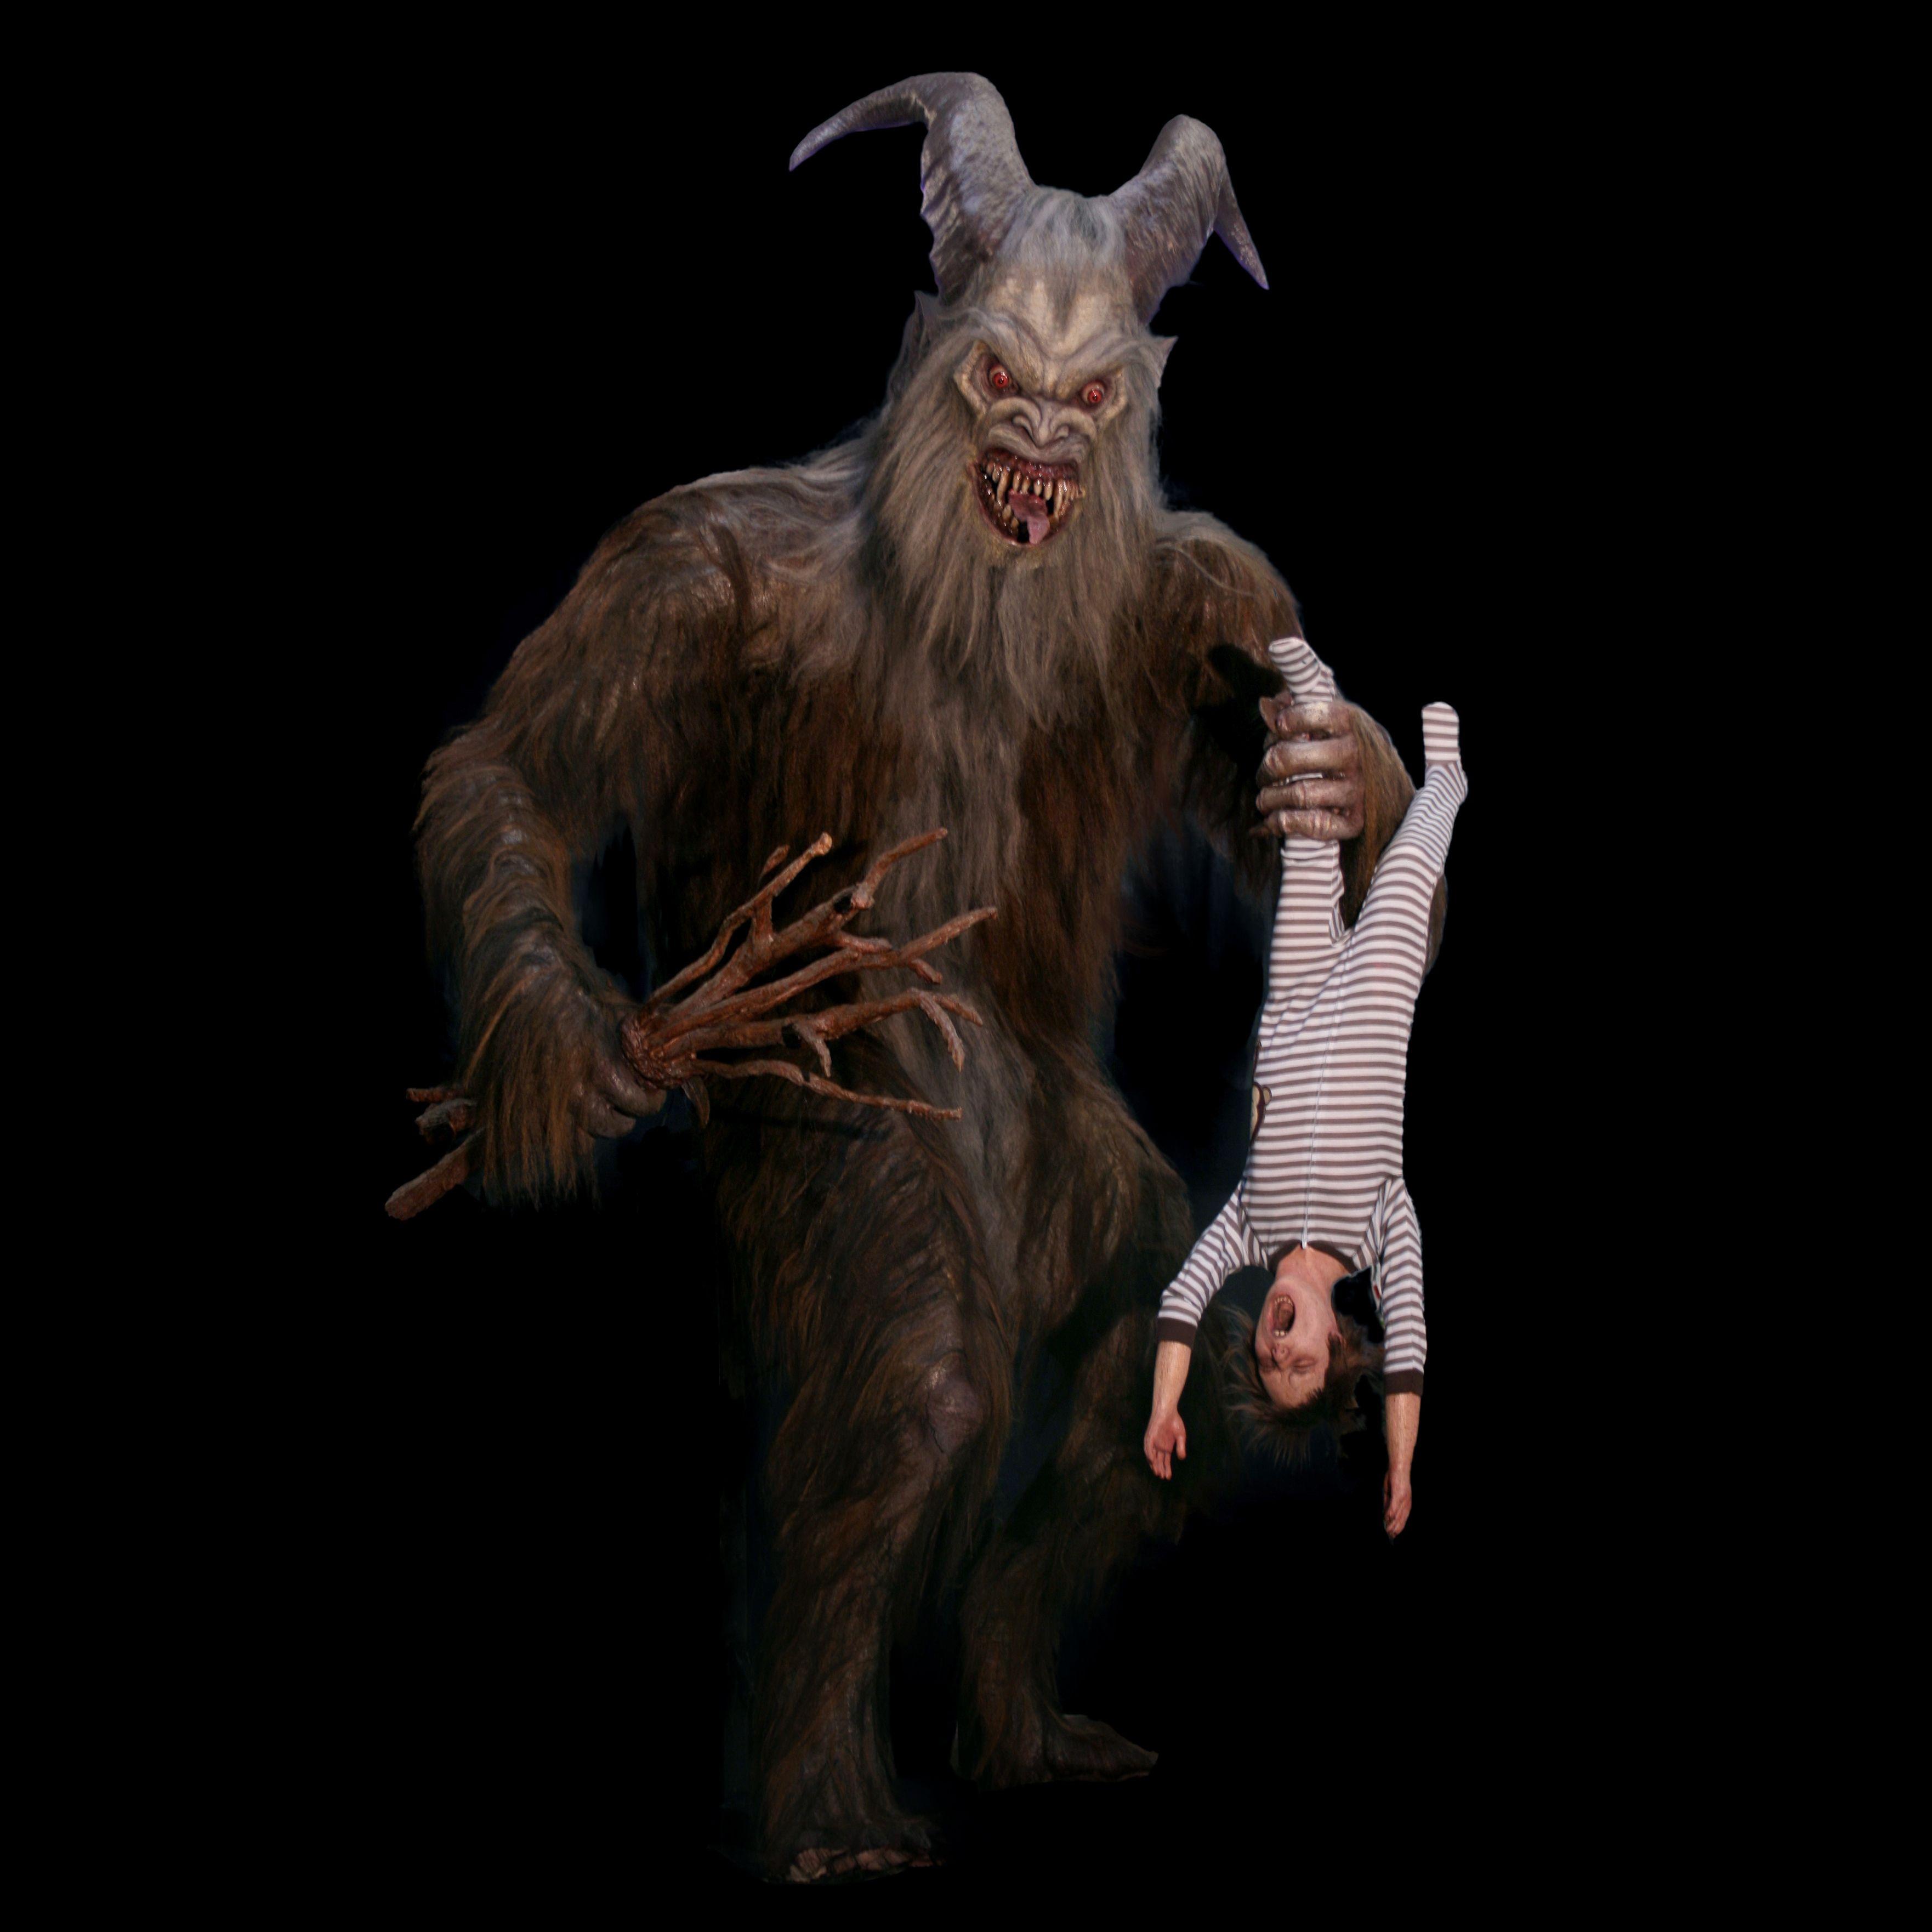 Giant Krampus And Child Animated Halloween Krampus